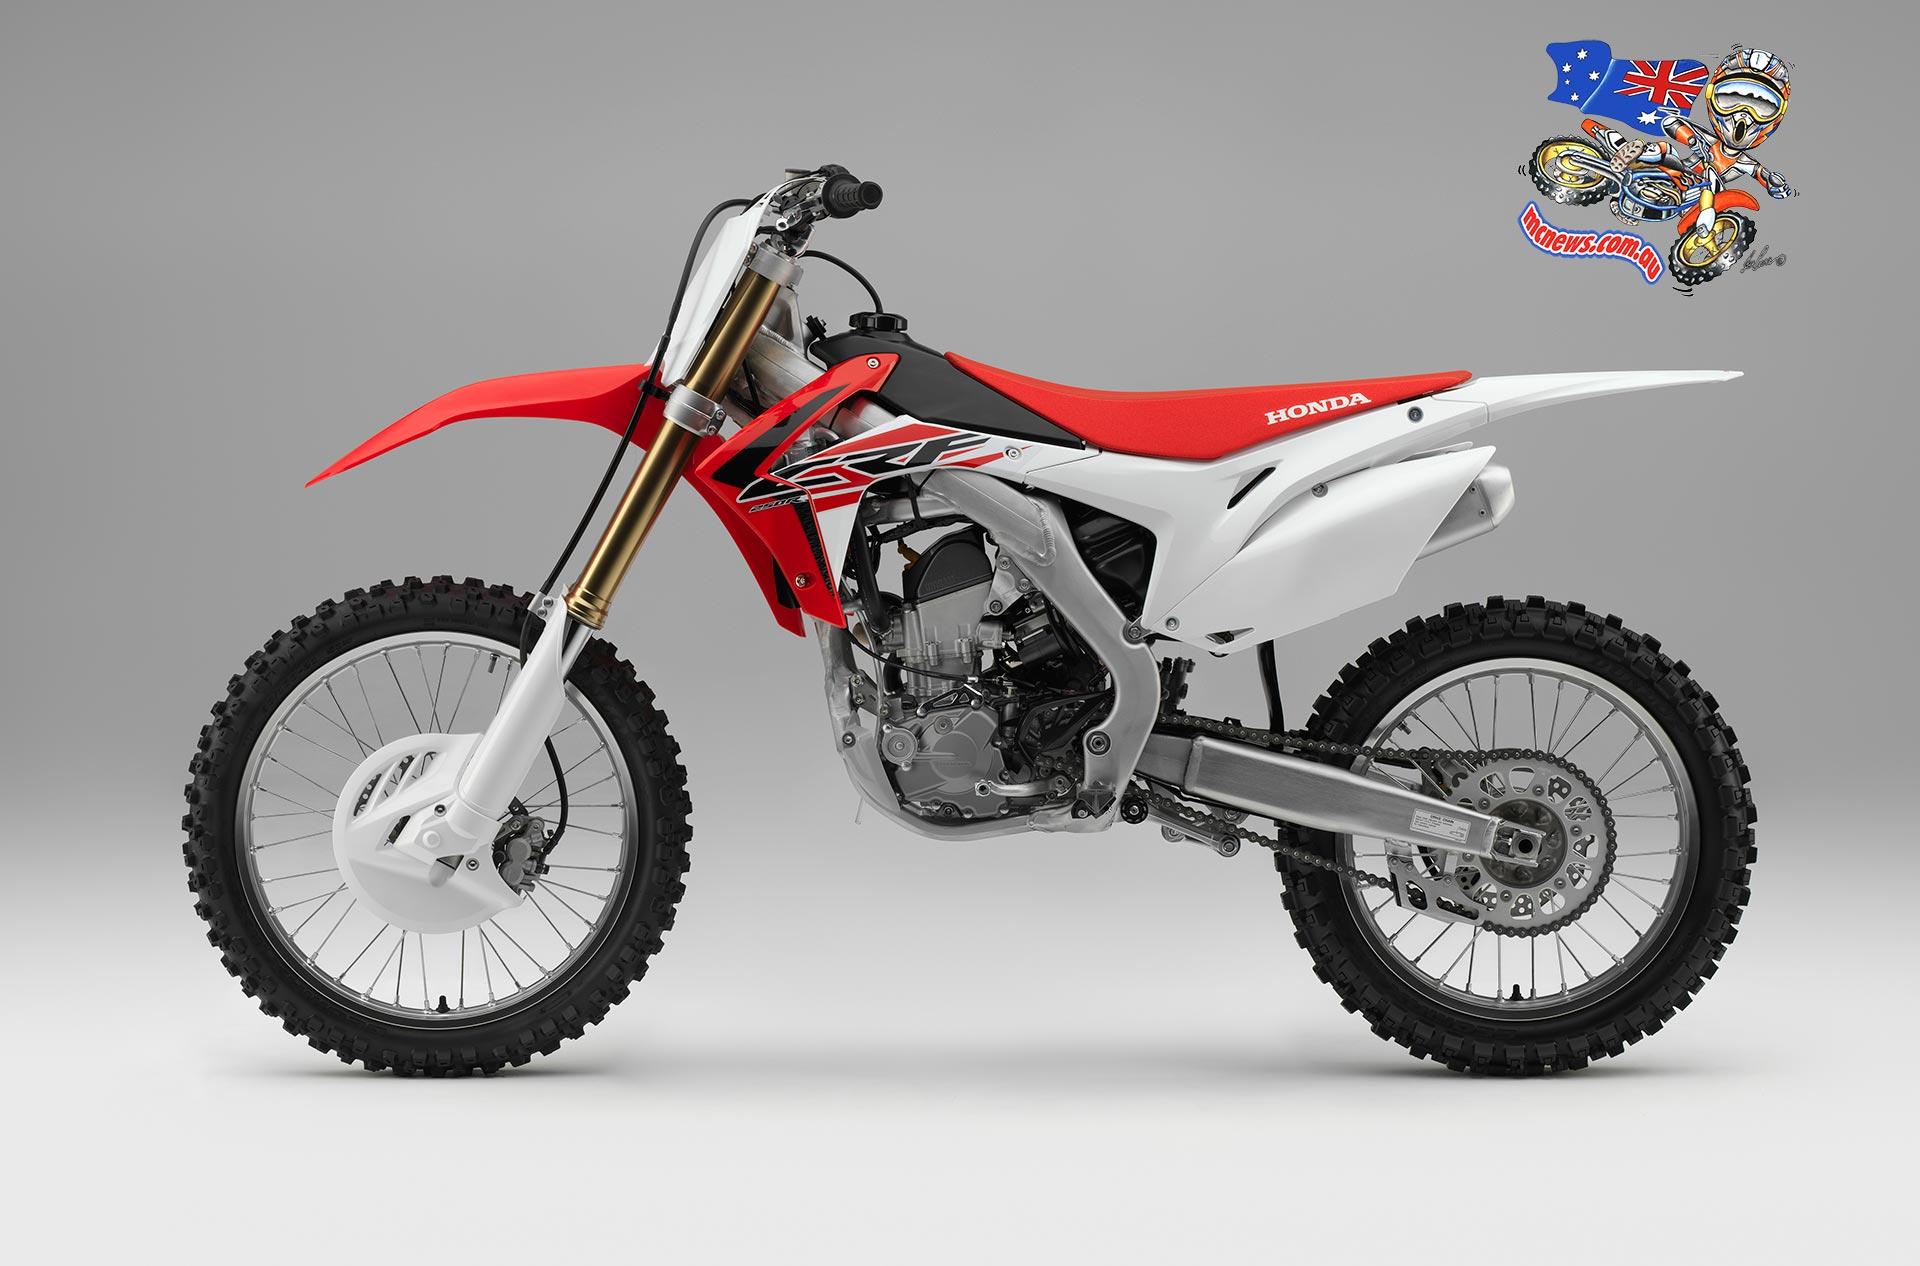 2018 Crf250r Price >> 2015 Honda CRF250R